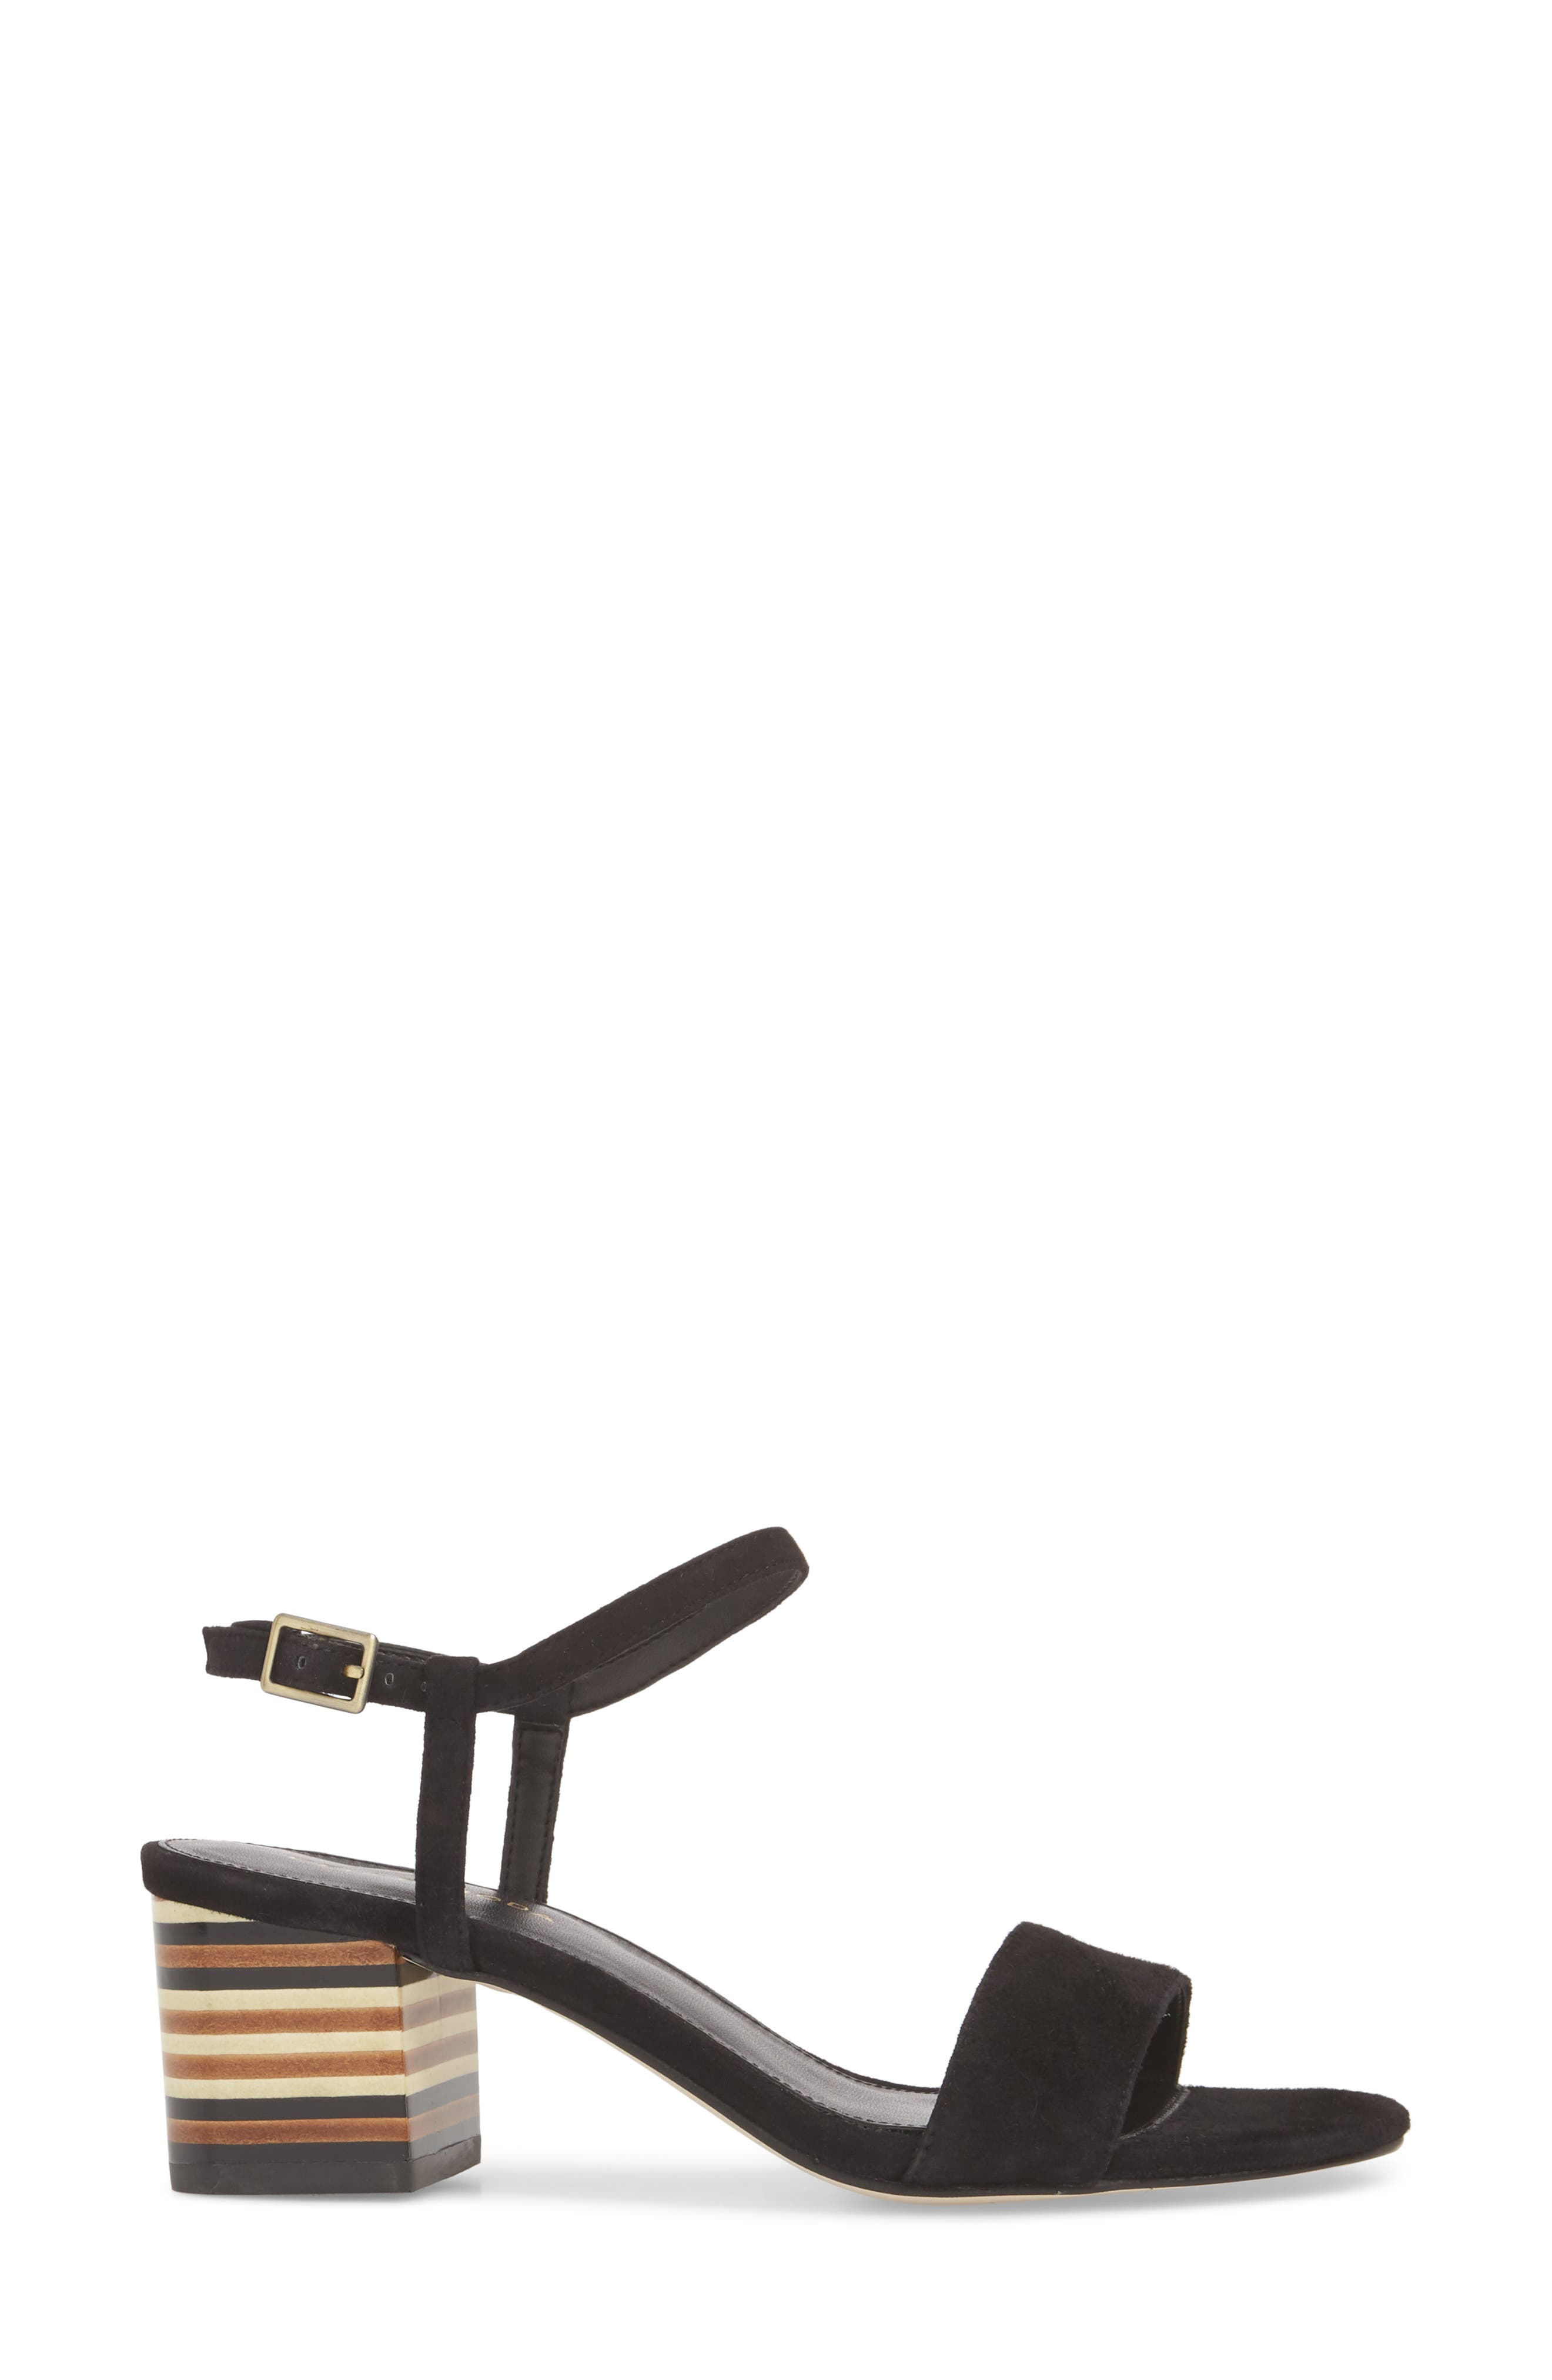 Alicia Block Heel Sandal,                             Alternate thumbnail 3, color,                             BLACK SUEDE